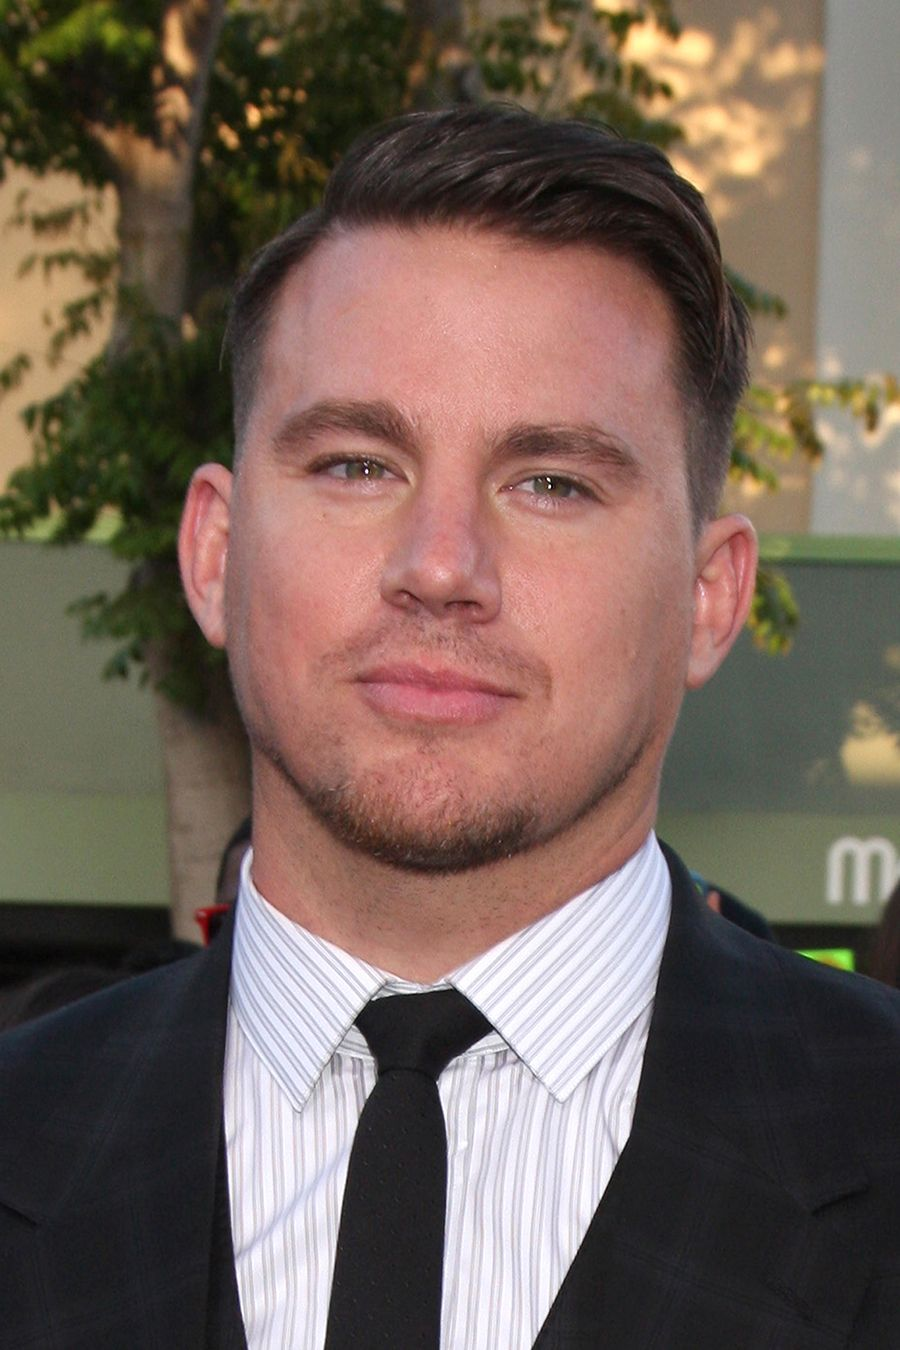 Channing Tatum fará filme dramático / Helga Esteb/Shutterstock.com